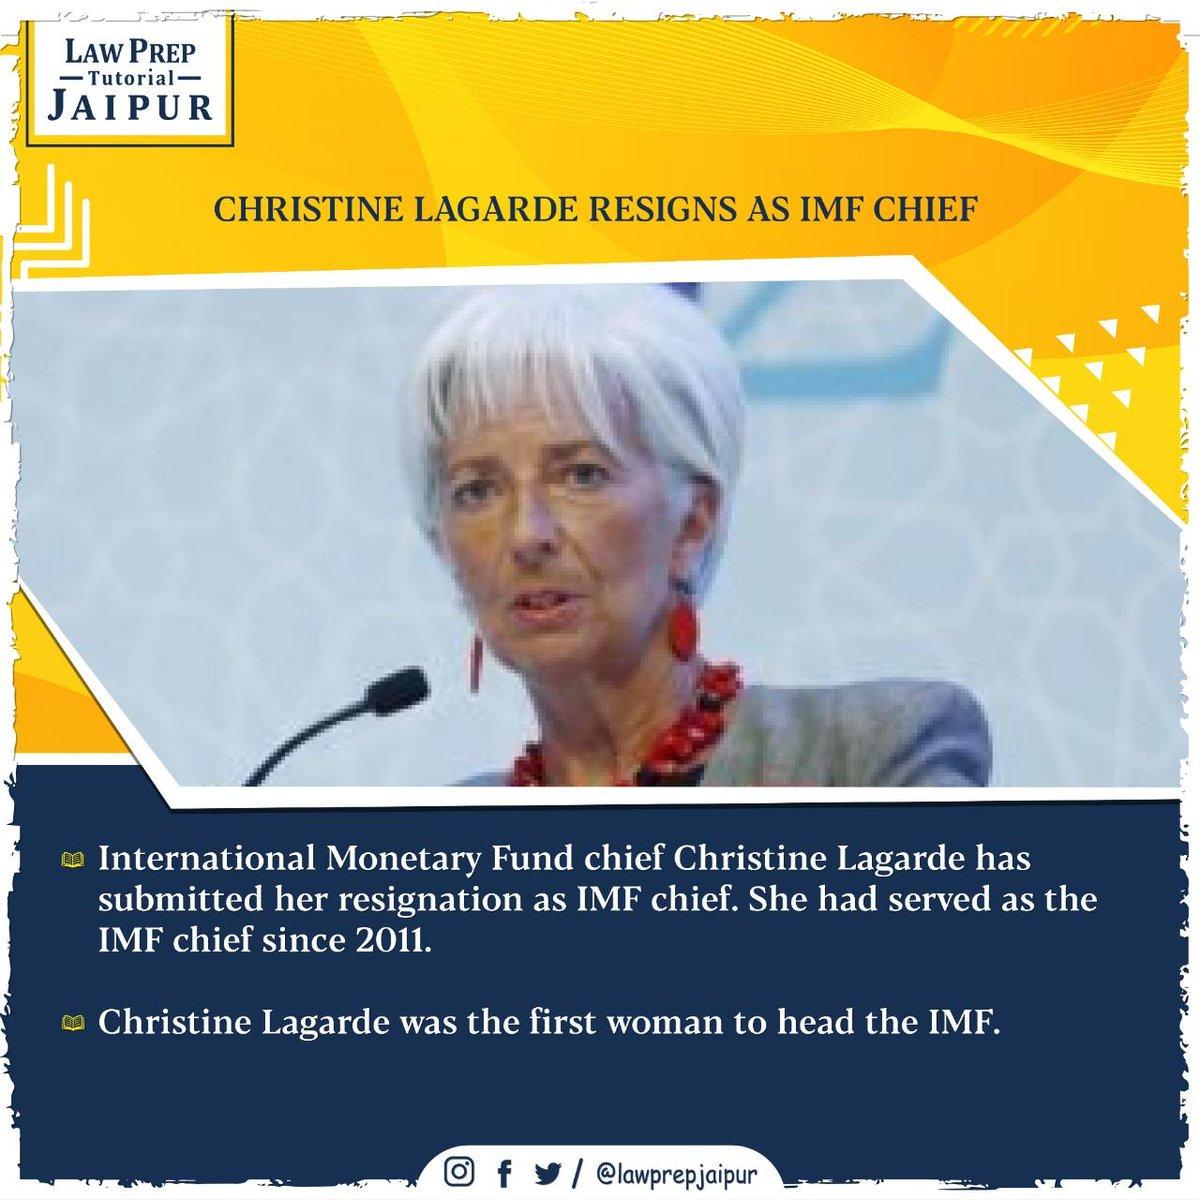 Stay connected for more such Current Affairs.  #Gk #CLATGK #CLAT2020 #CLATQuestions #currentaffairs #LegalGk #InternationalMonetaryFund #IMF #ChristineLagarde